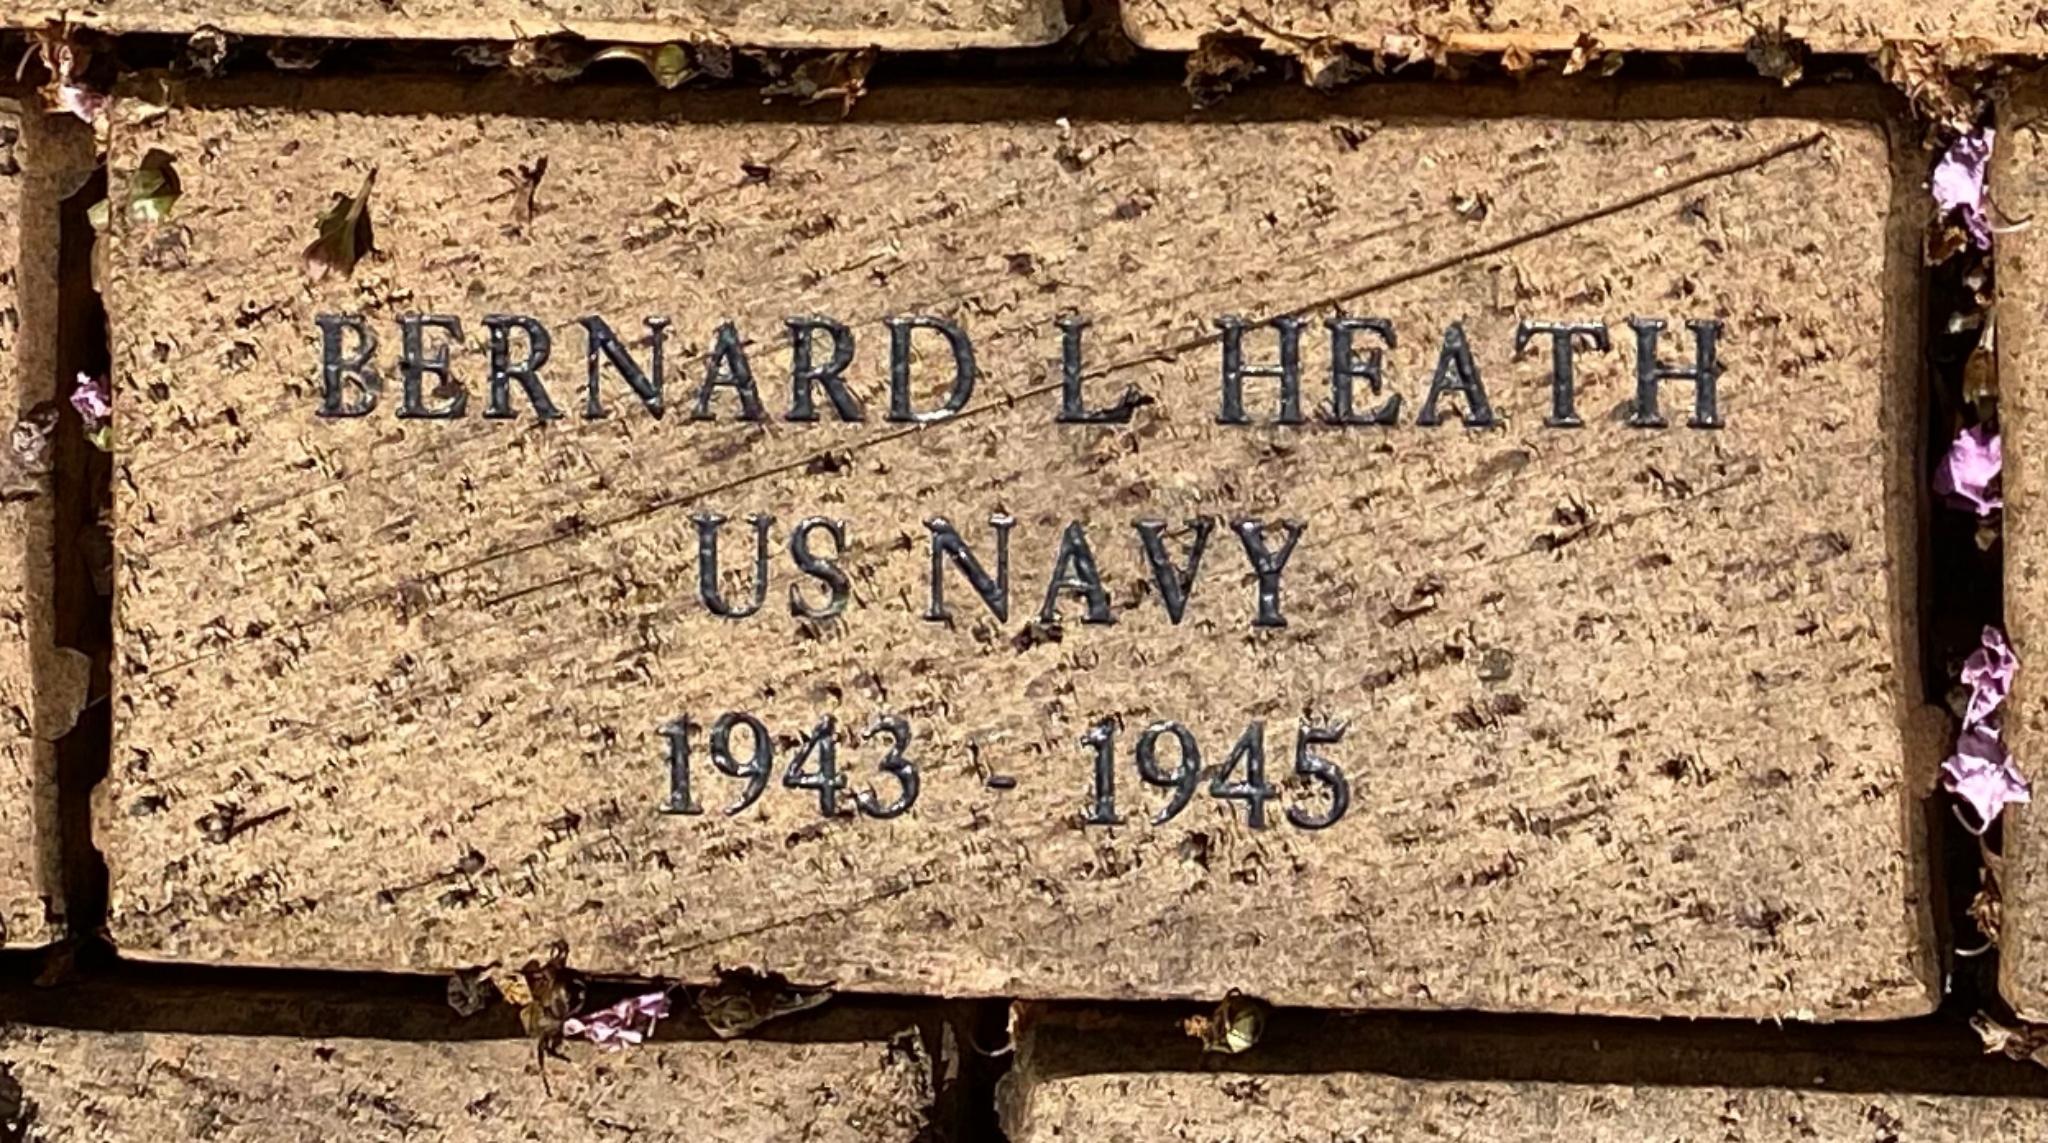 BARNARD L HEATH U S NAVY 1943 – 1945